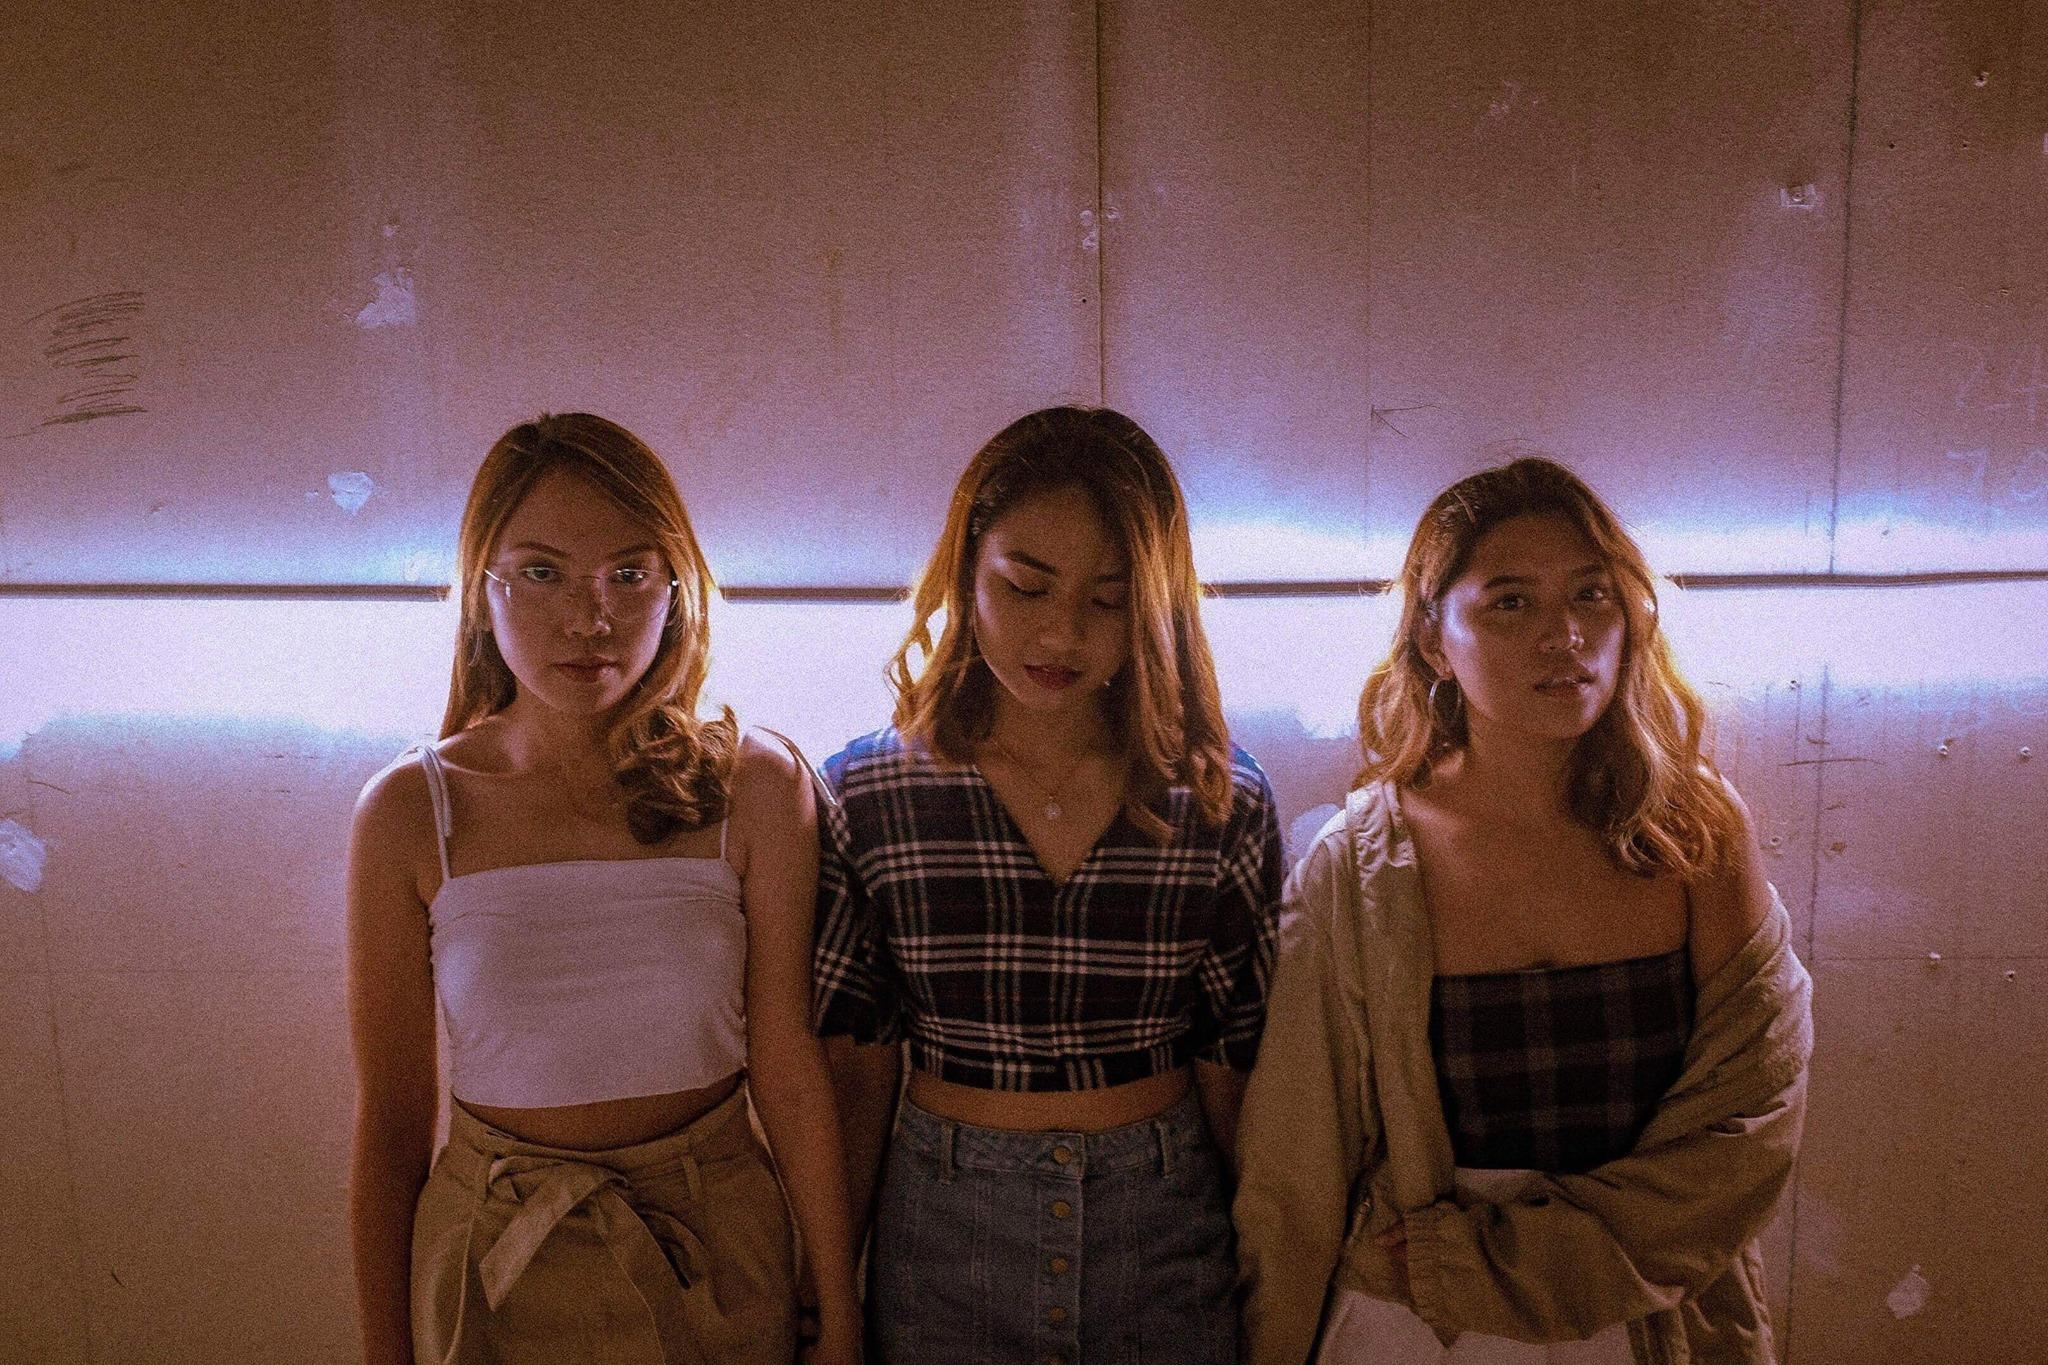 THREE OF US. Photo by Merphi Panaguiton